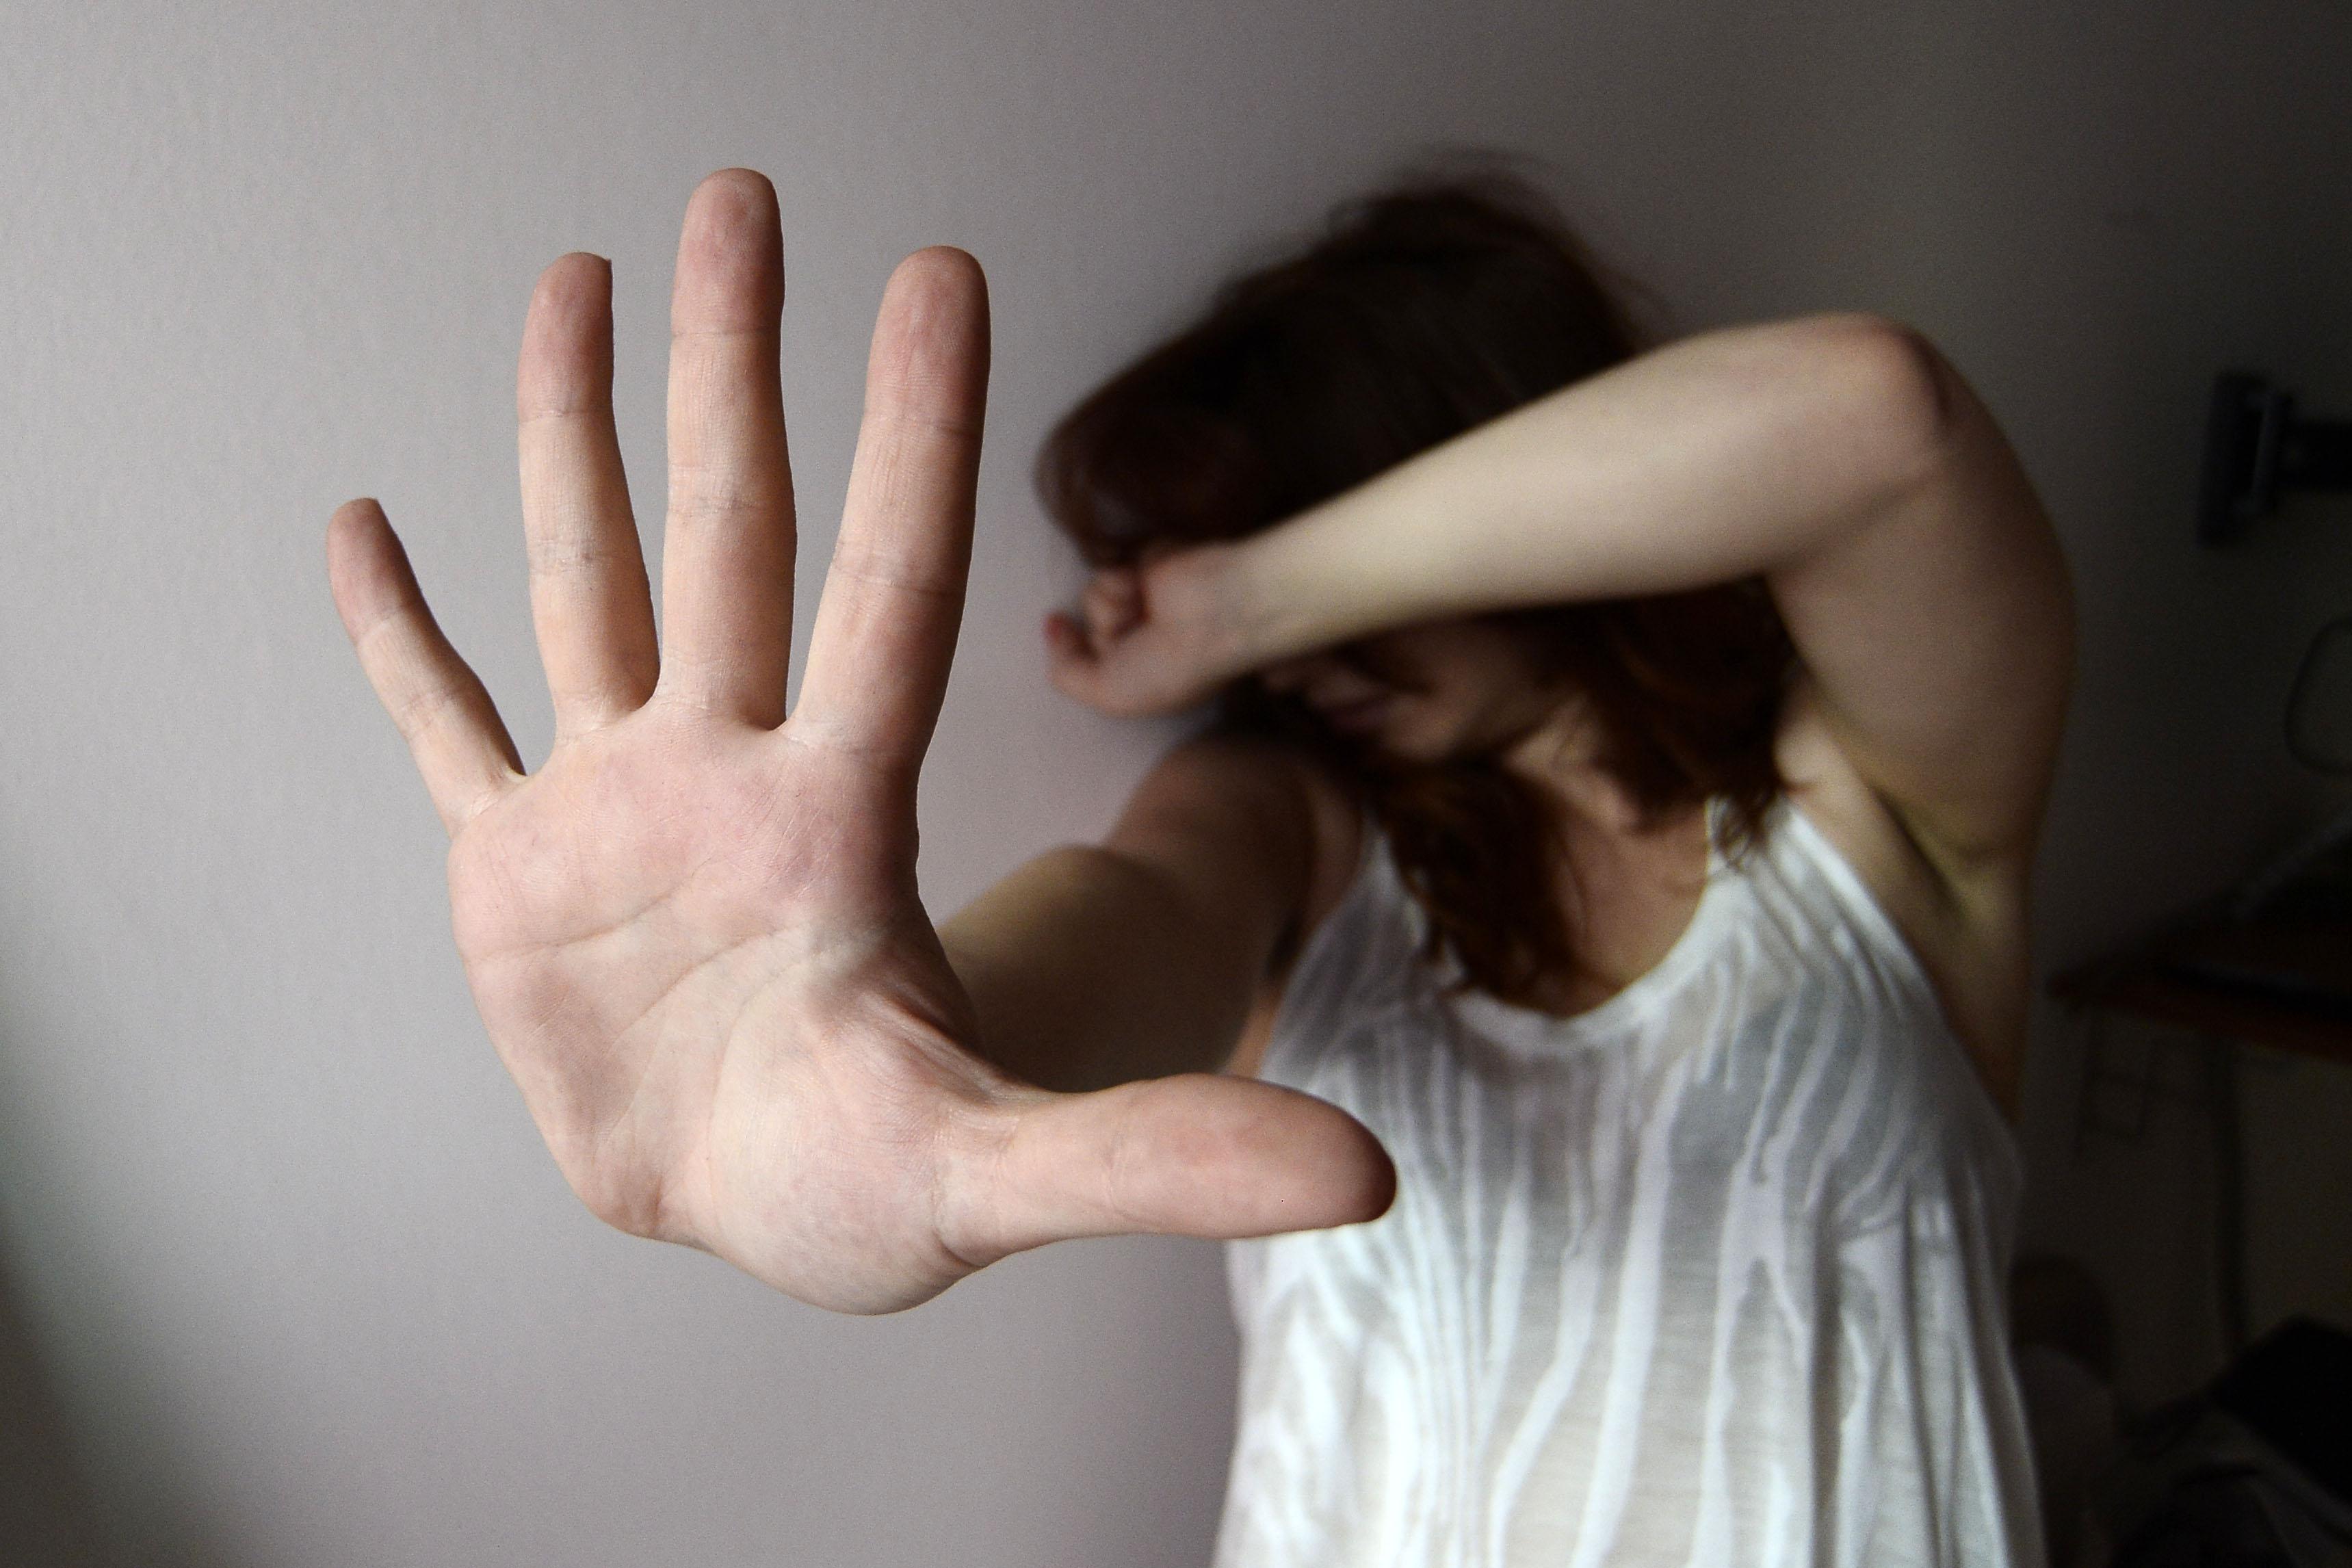 Incontri abusi quiz